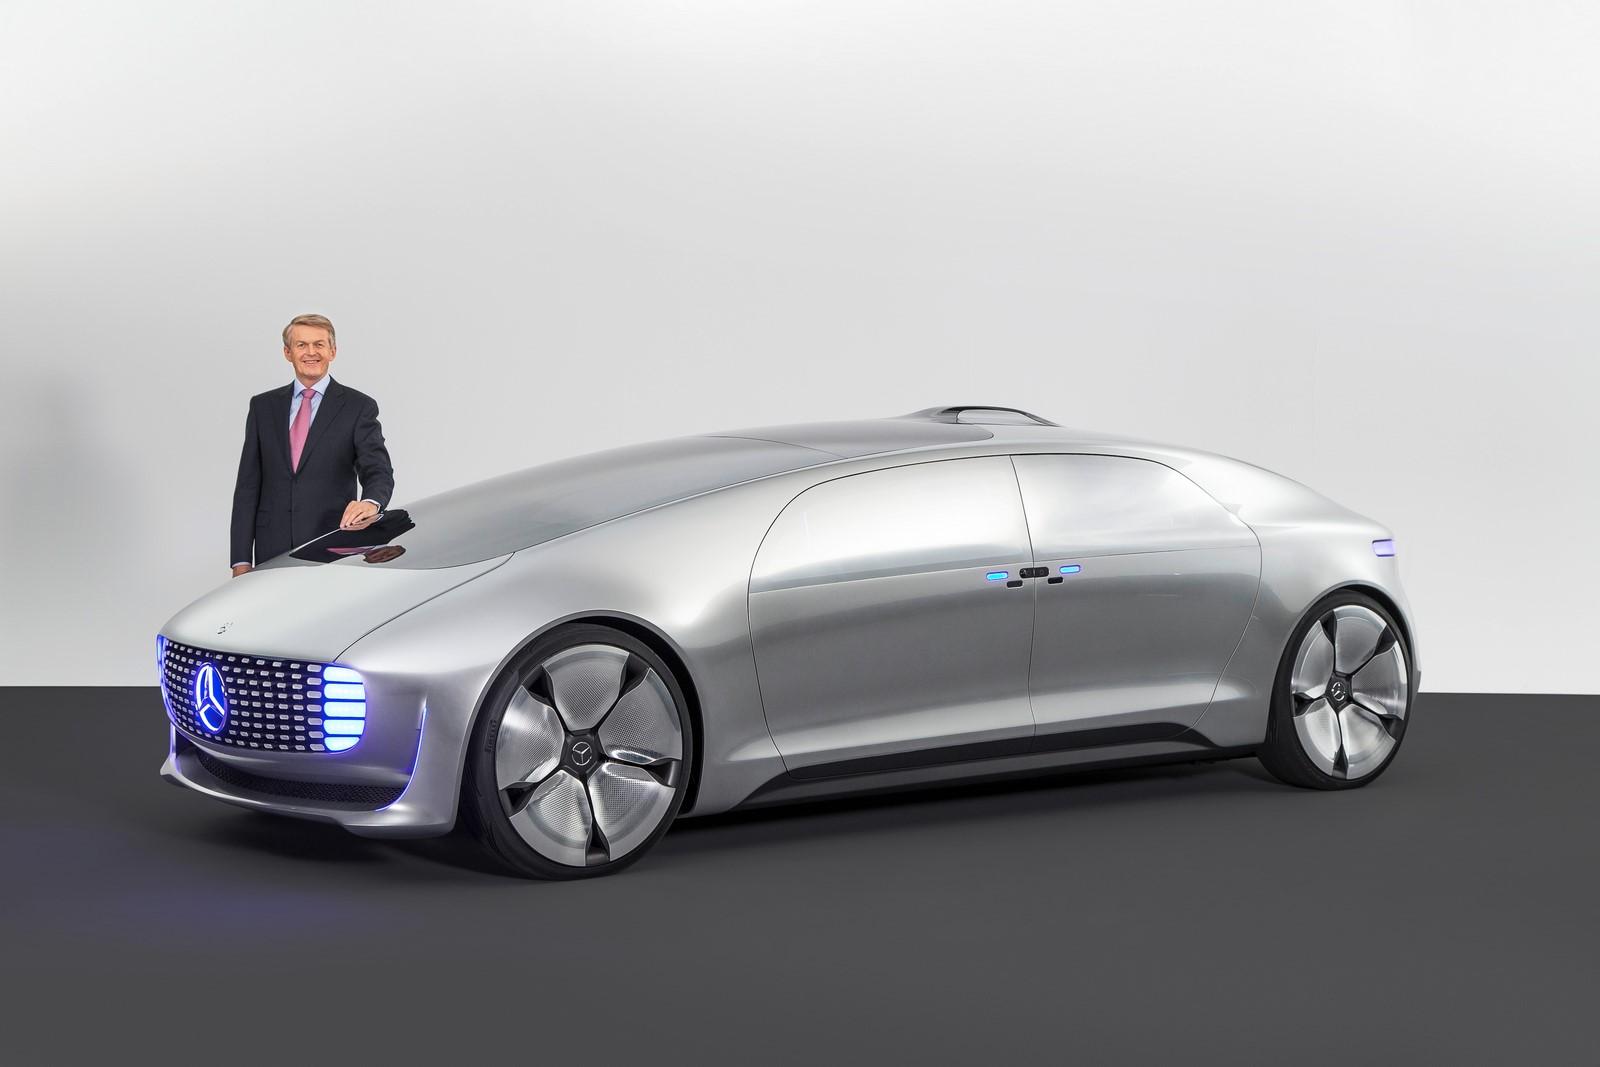 Mercedes benz f 015 luxury in motion concept for Mercedes benz schererville in